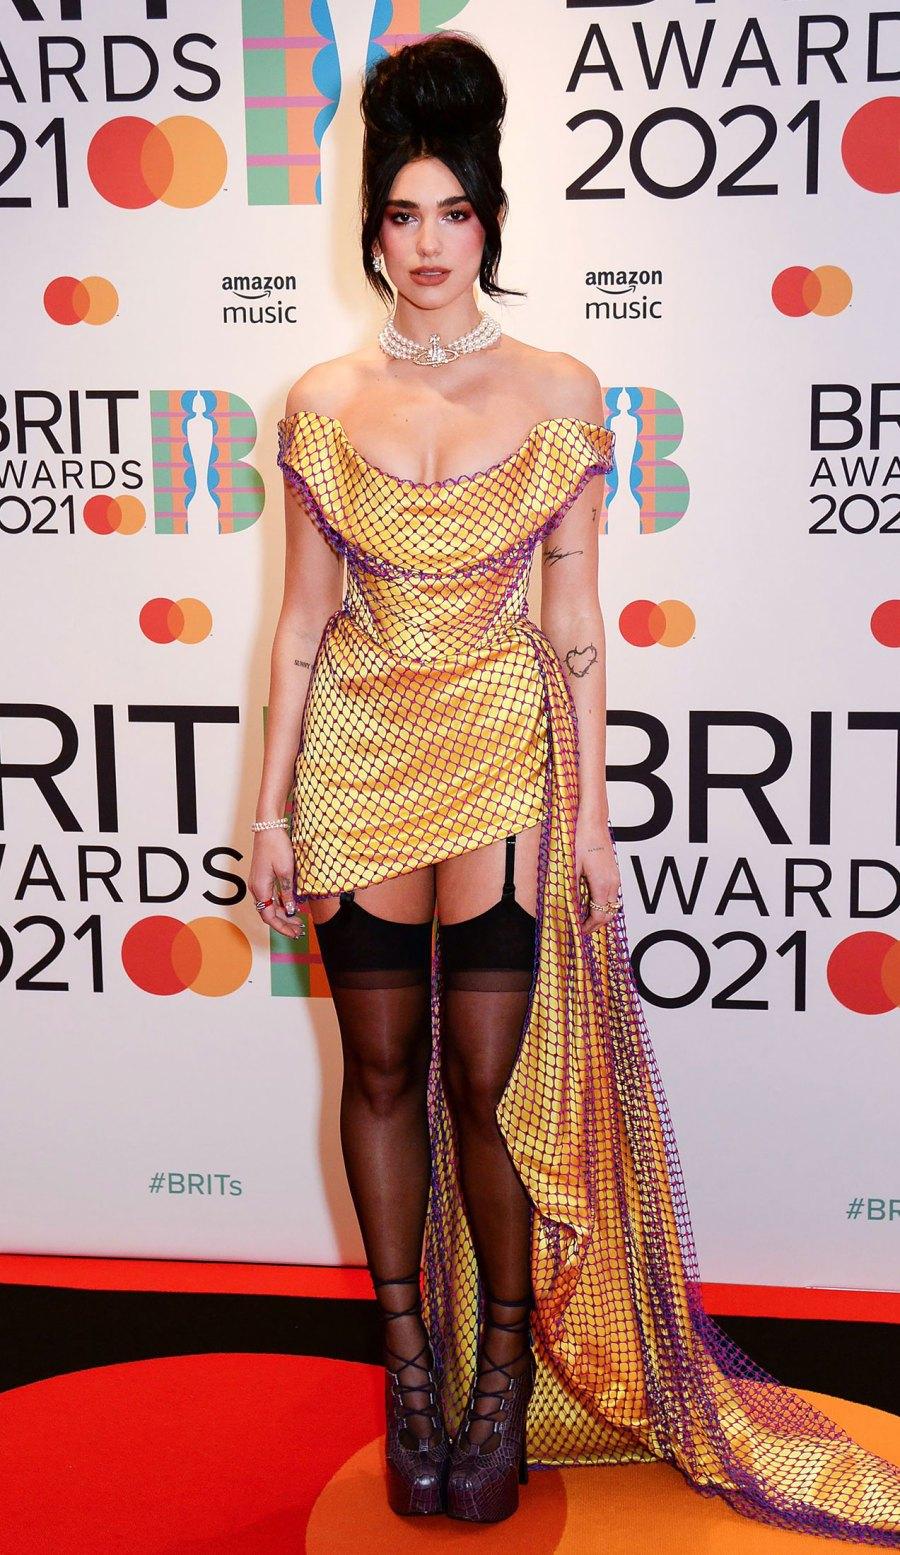 2021 BRIT Awards Red Carpet Arrivals - Dua Lipa